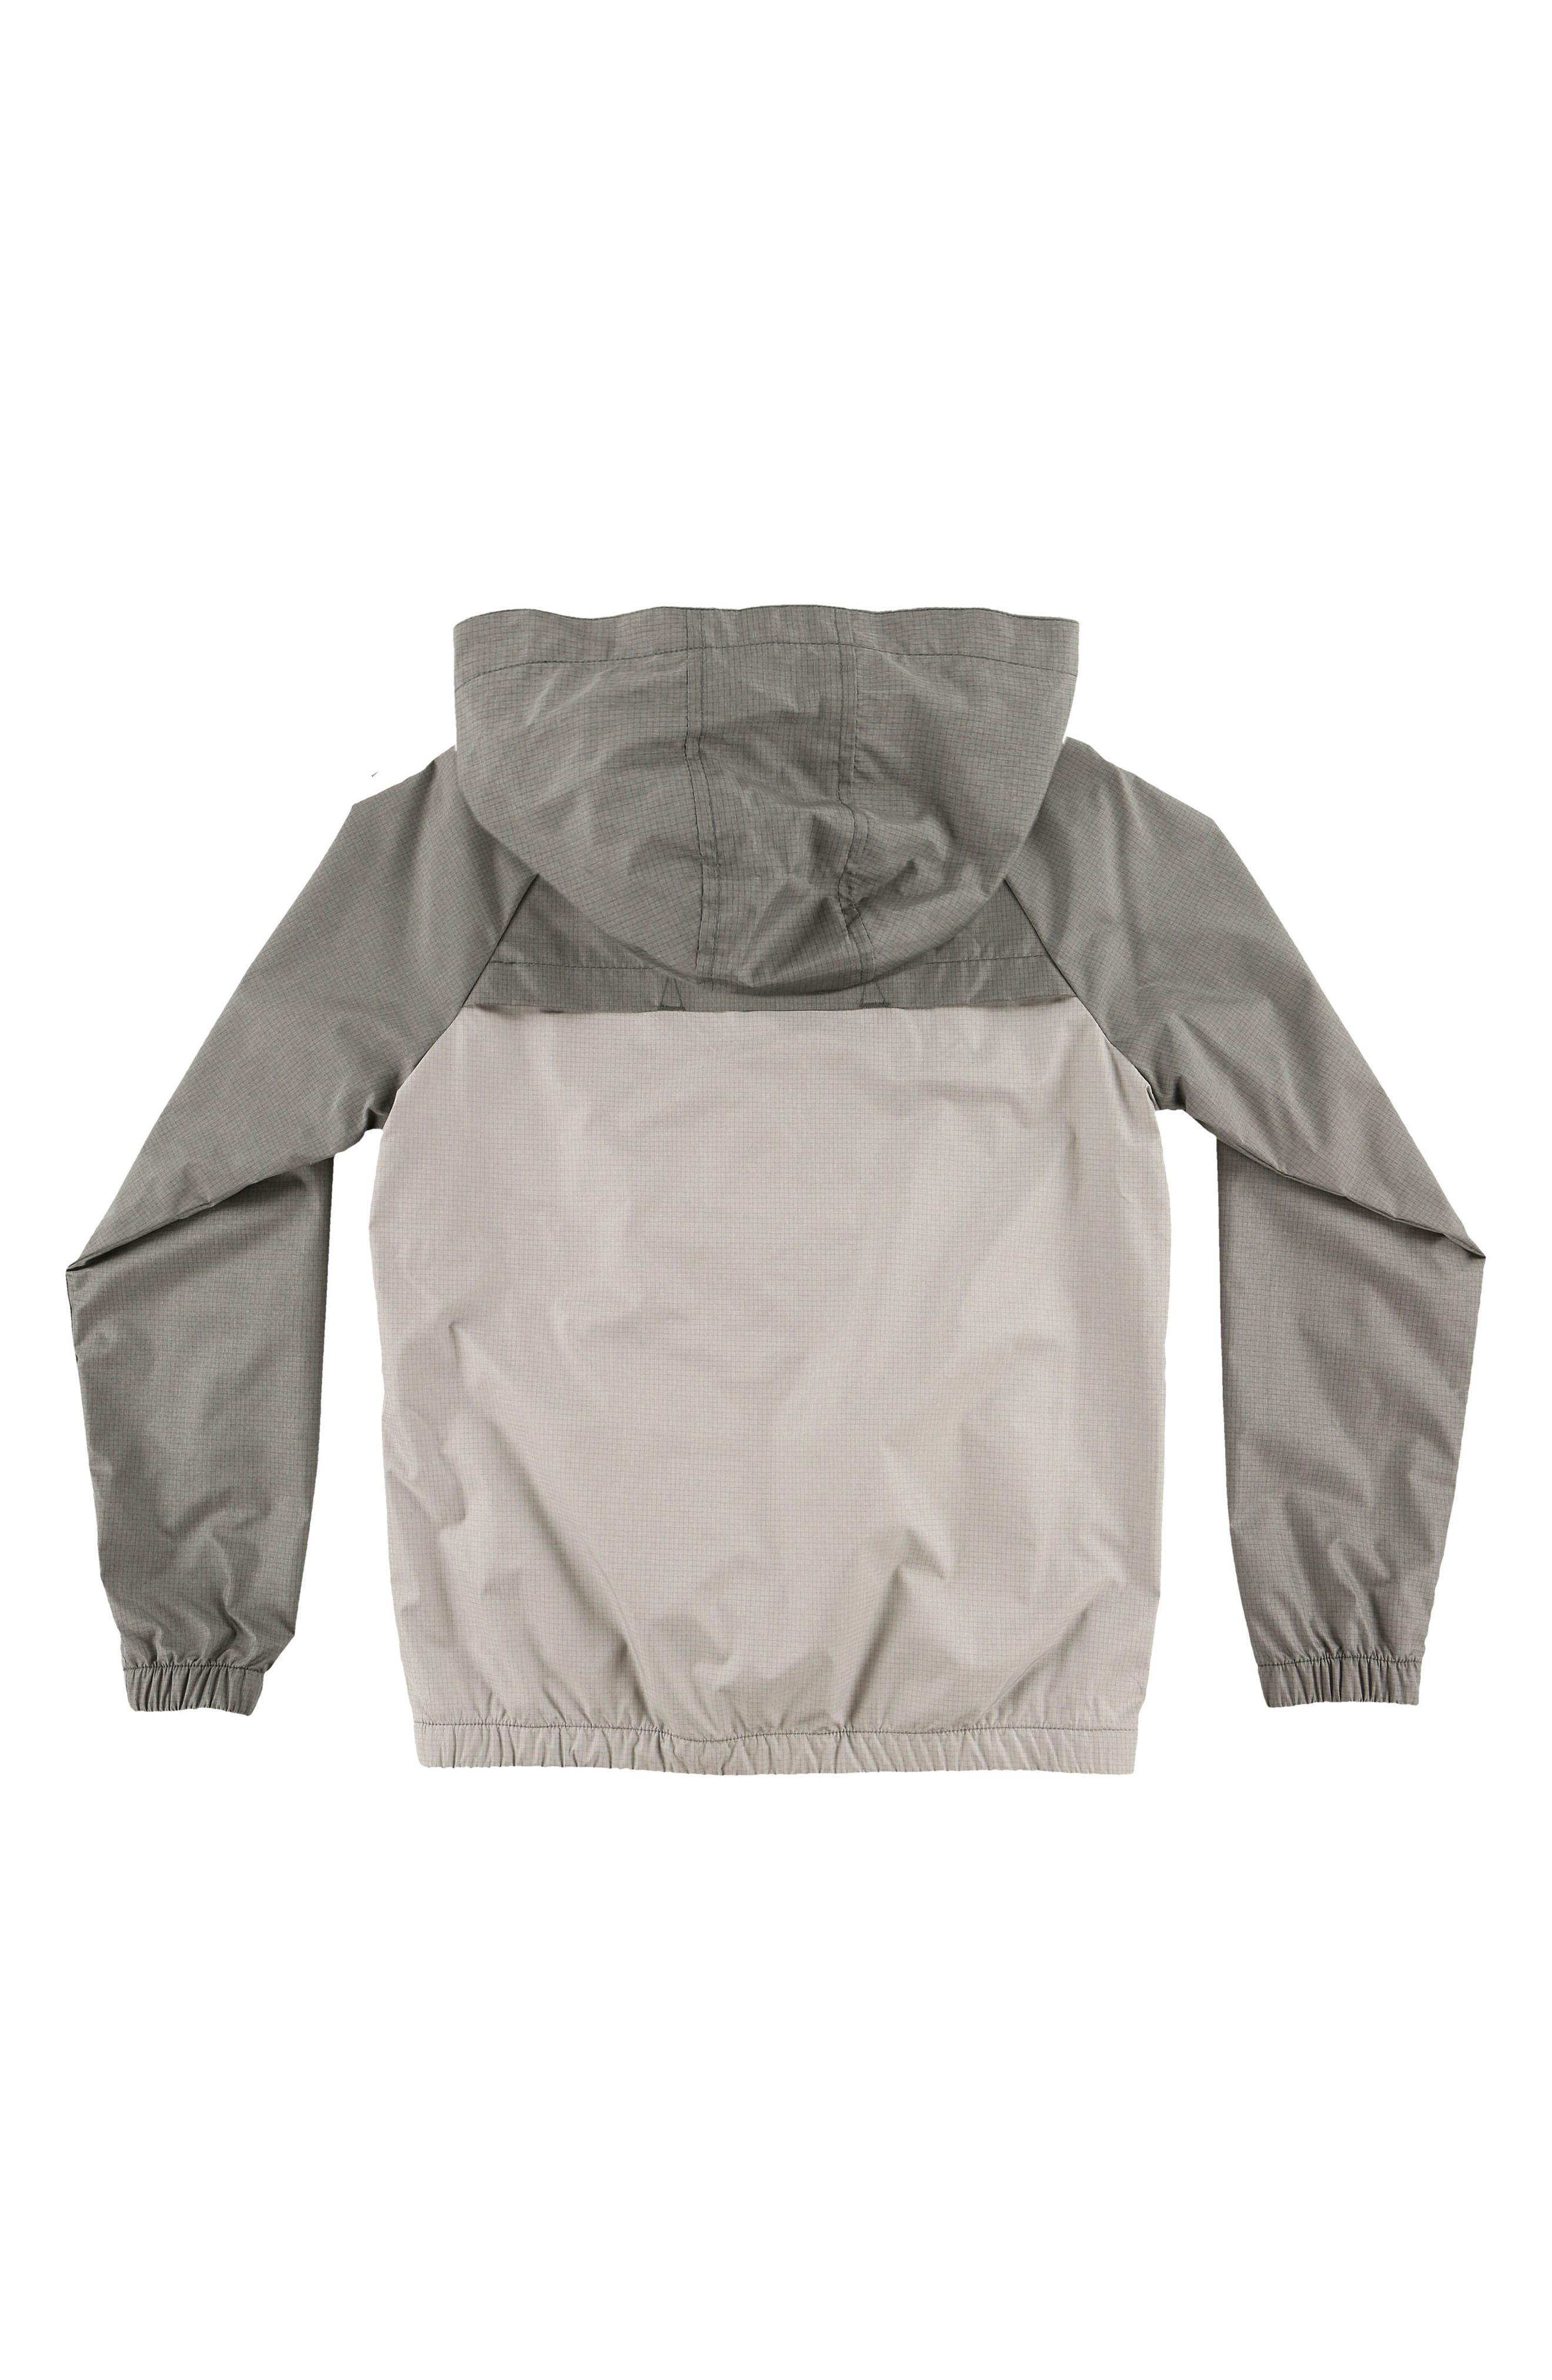 Alternate Image 2  - O'Neill Traveler Packable Windbreaker Jacket (Toddler Boys, Little Boys & Big Boys)